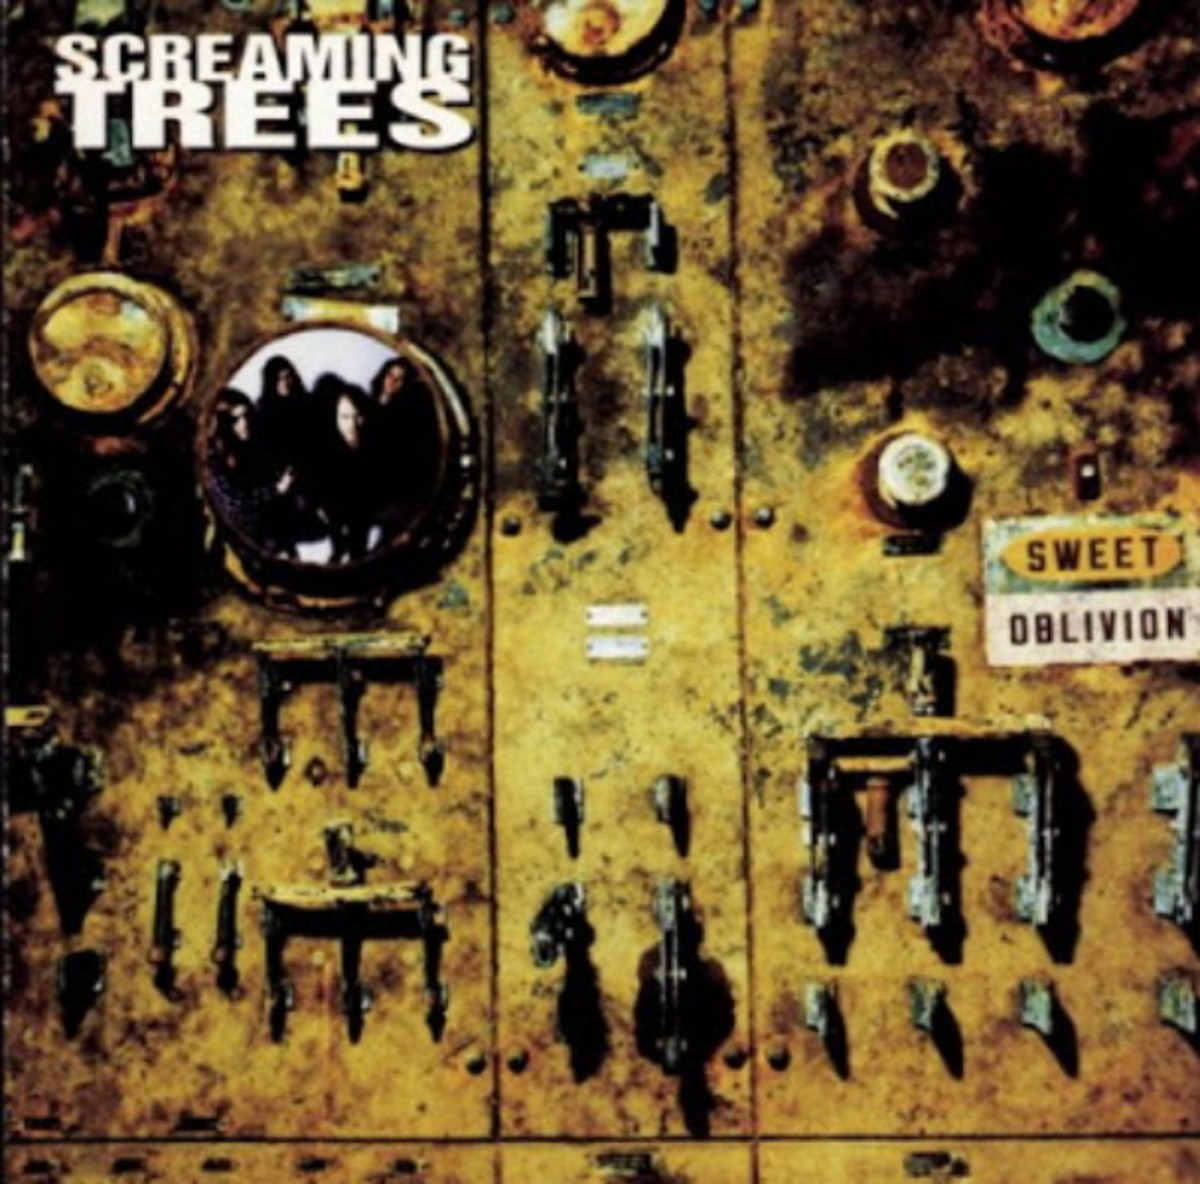 """Sweet Oblivion"" by Screaming Trees"